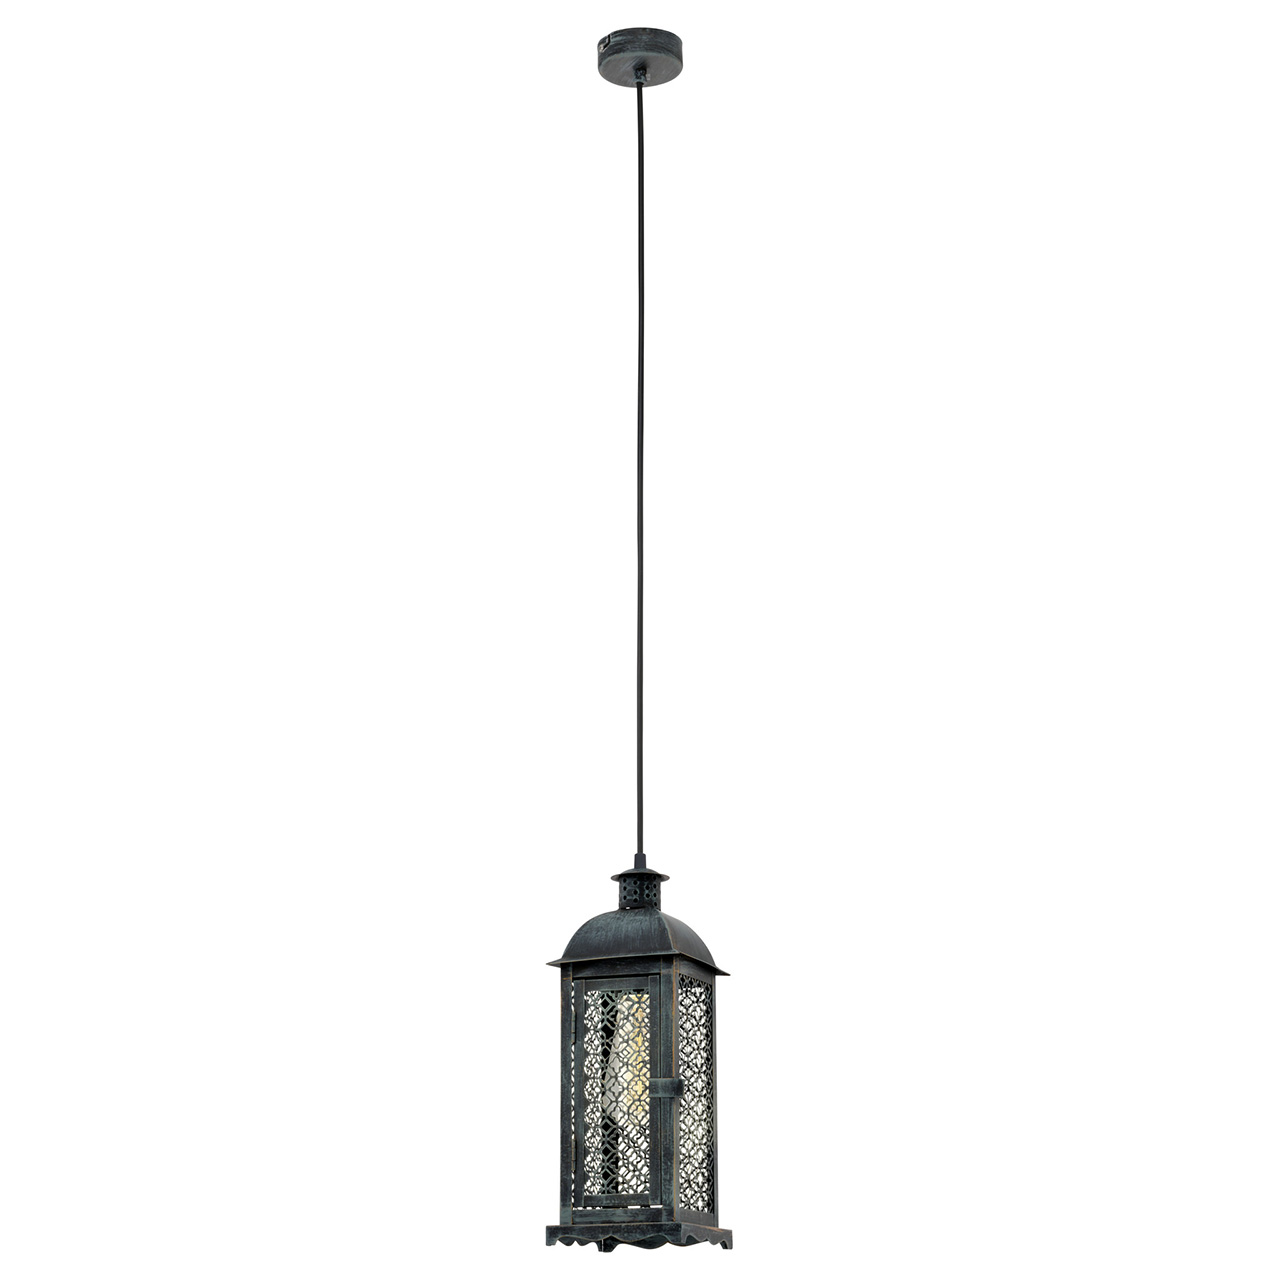 Подвесной светильник Eglo Vintage 49215 абажур eglo vintage 49657